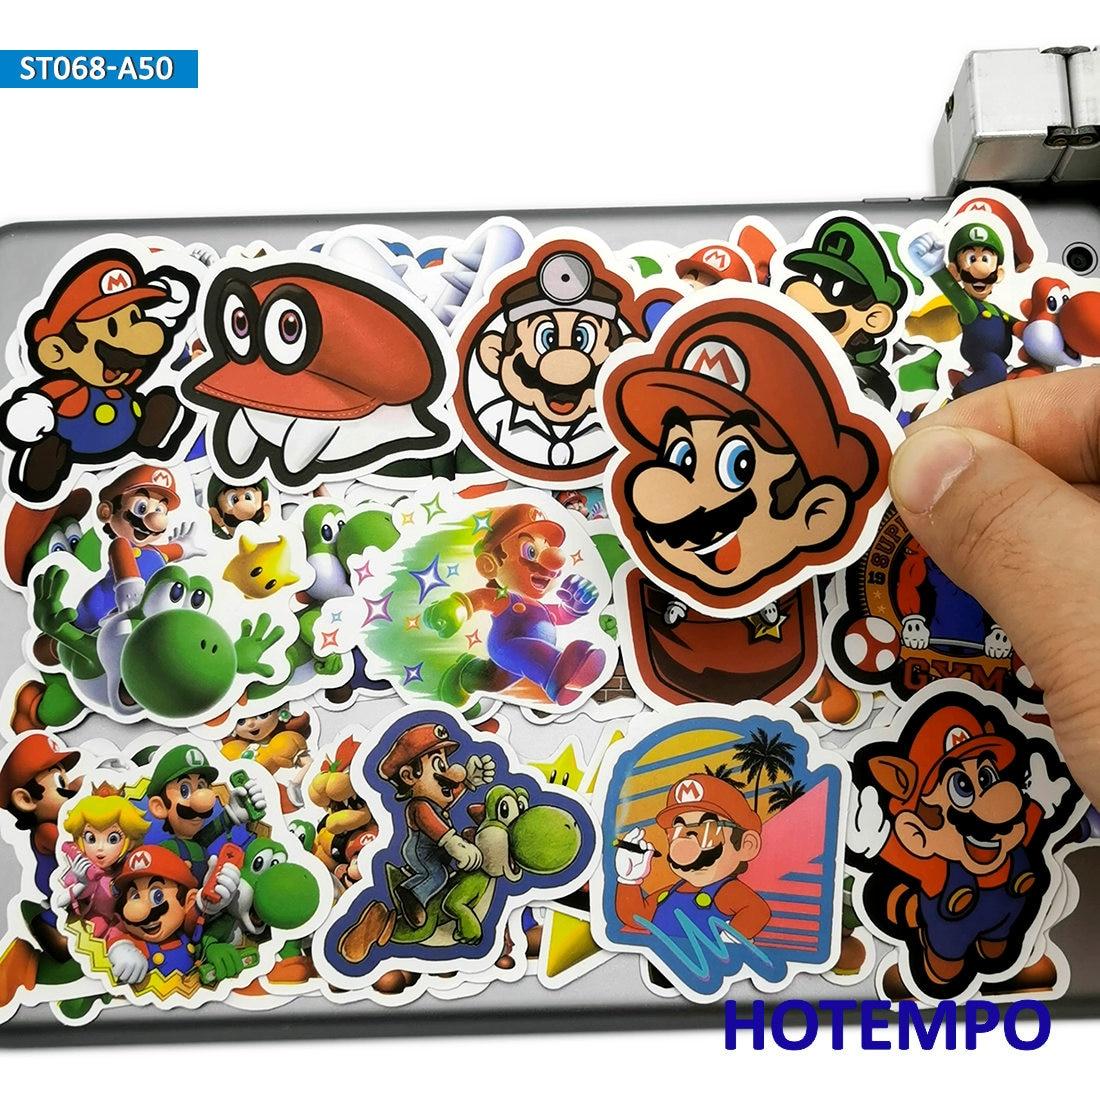 50pcs Cartoon Super Hero Mario Luigi Games Stickers Toys For Mobile Phone Laptop Luggage Suitcase Skateboard Anime Decal Sticker